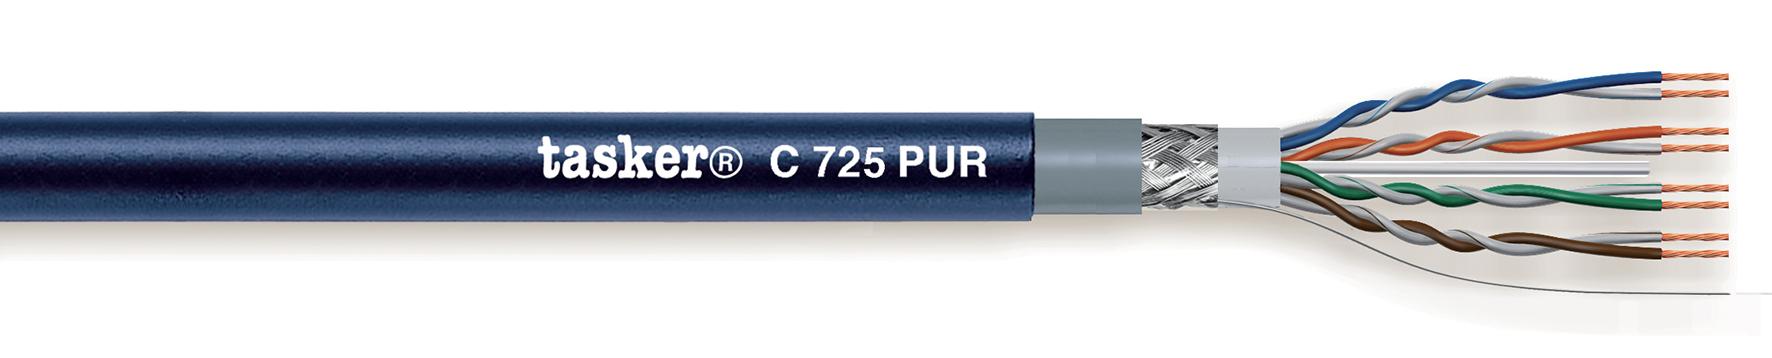 LAN cable 5e S-U.T.P.<br />C725 PUR.Mobile In/Outdoor